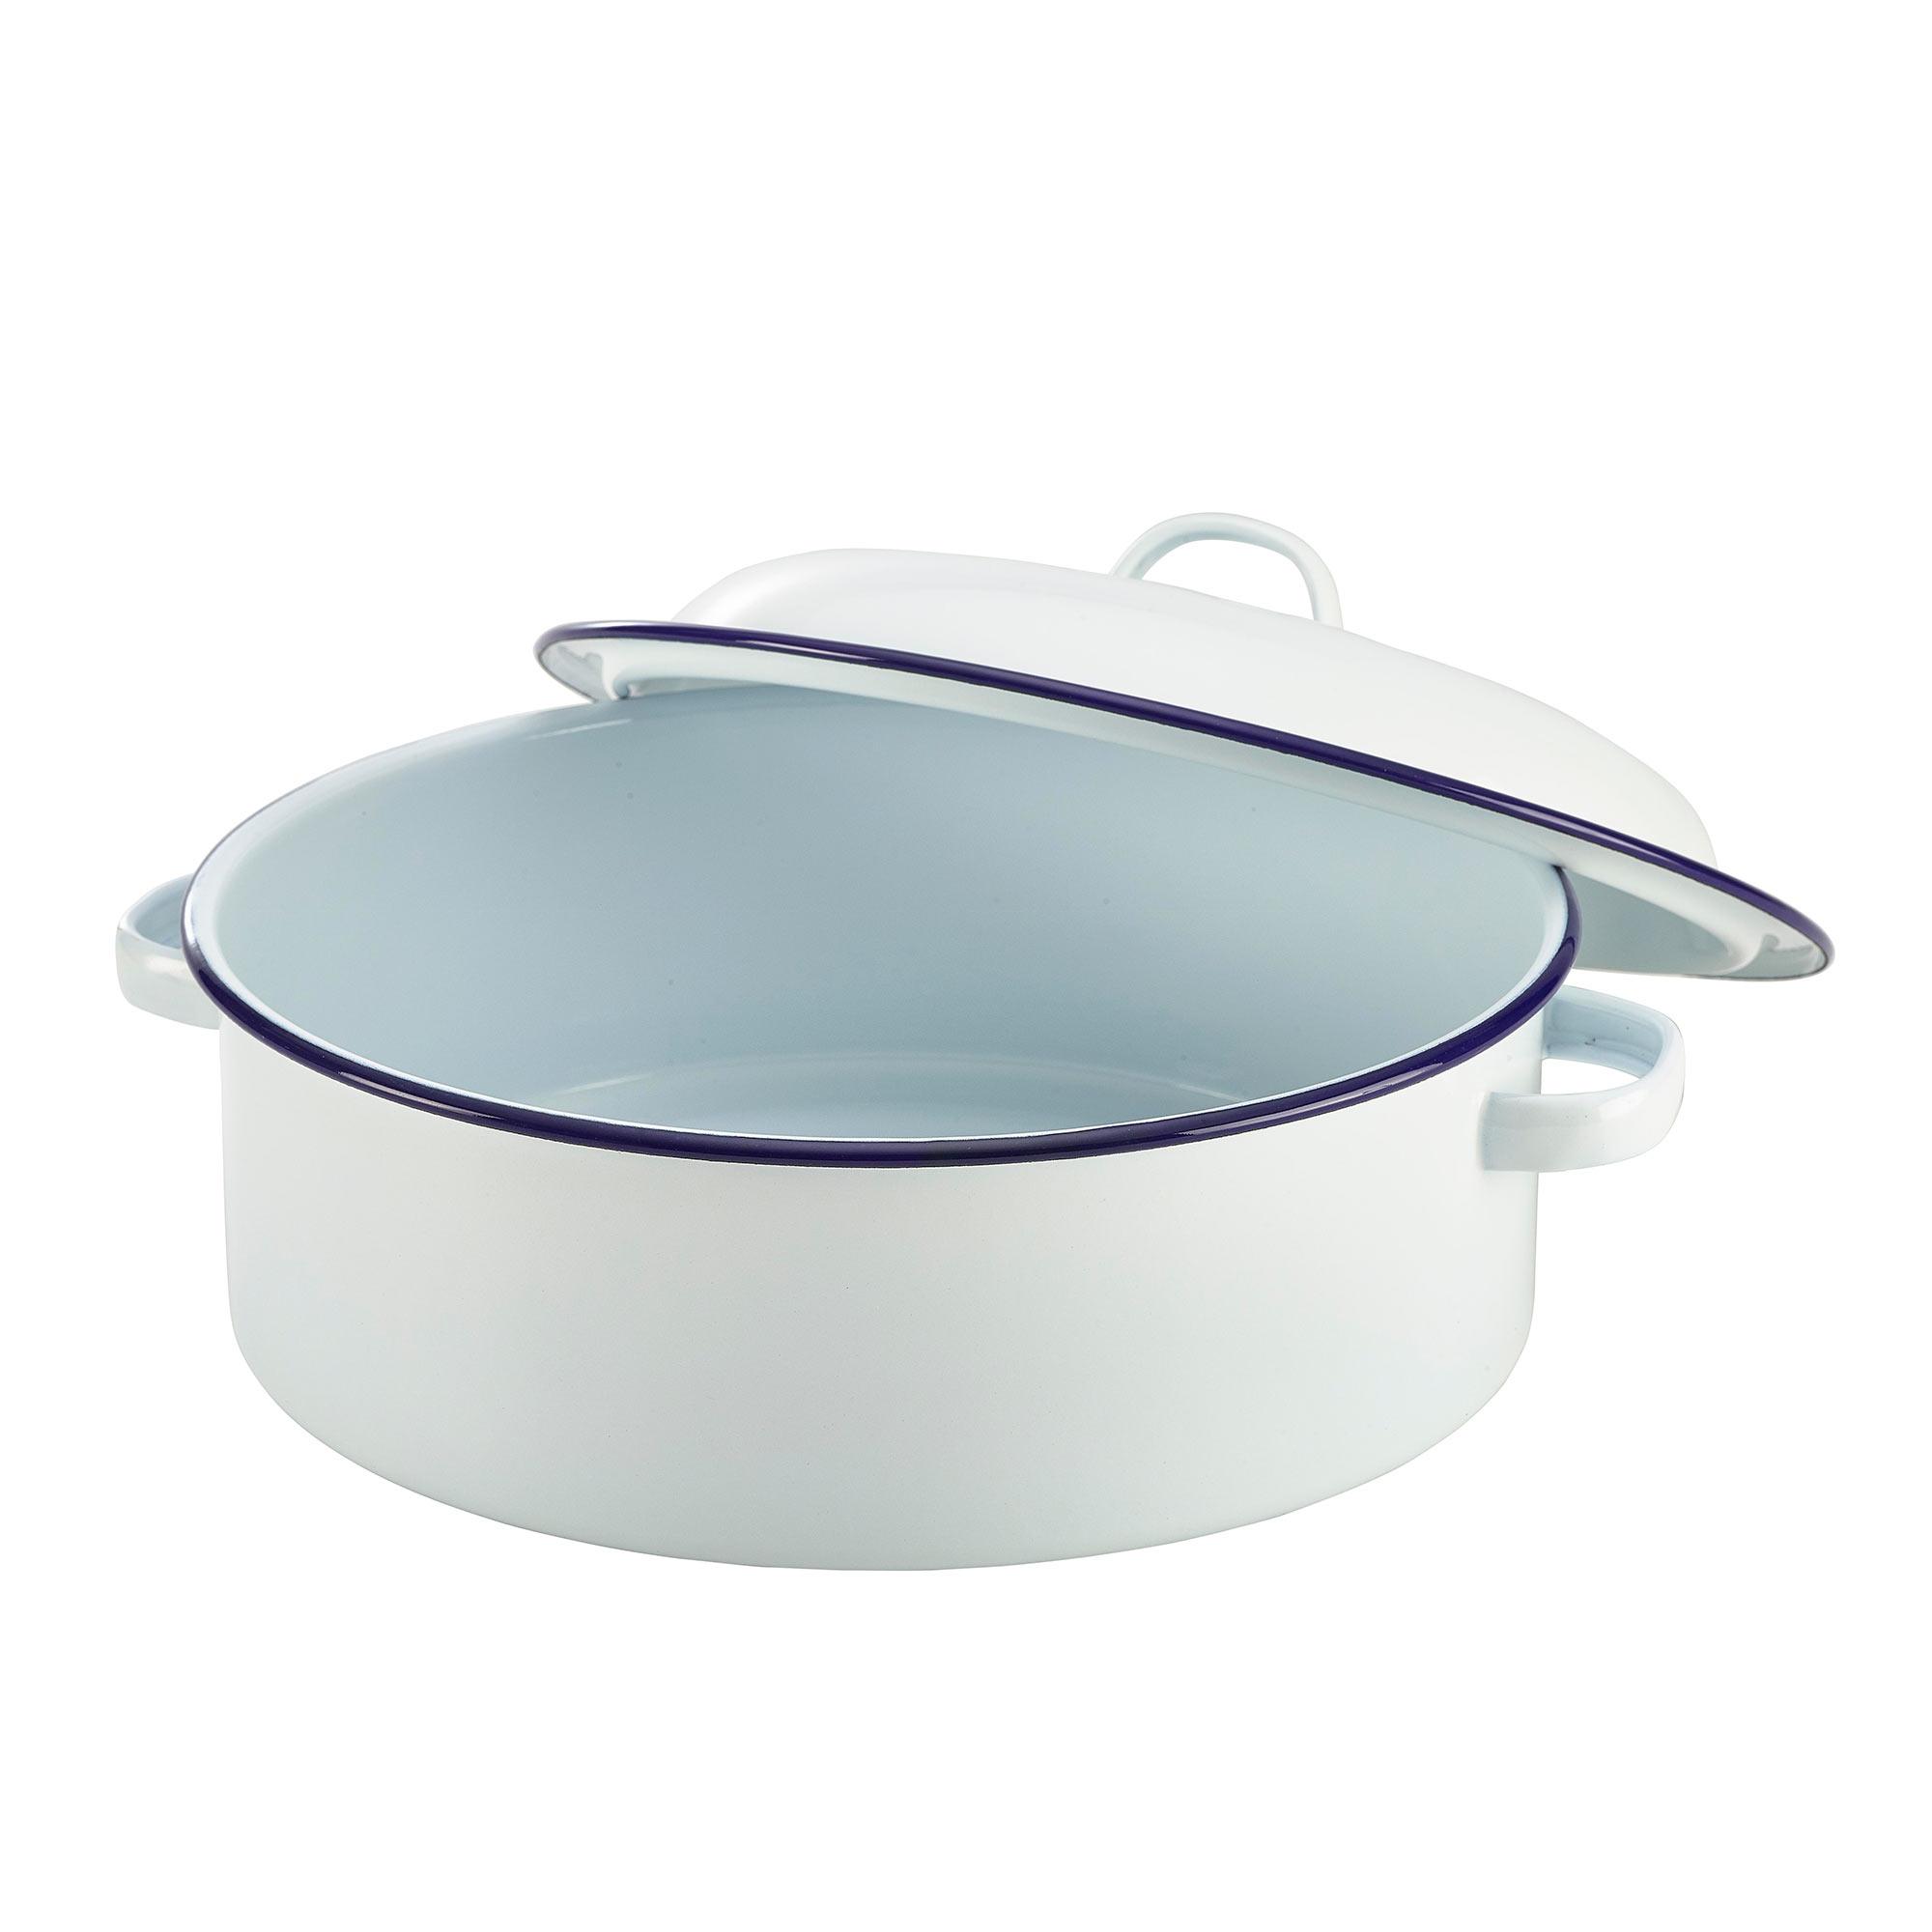 Enamel Coated White And Blue Roaster Dish 26cm At Drinkstuff